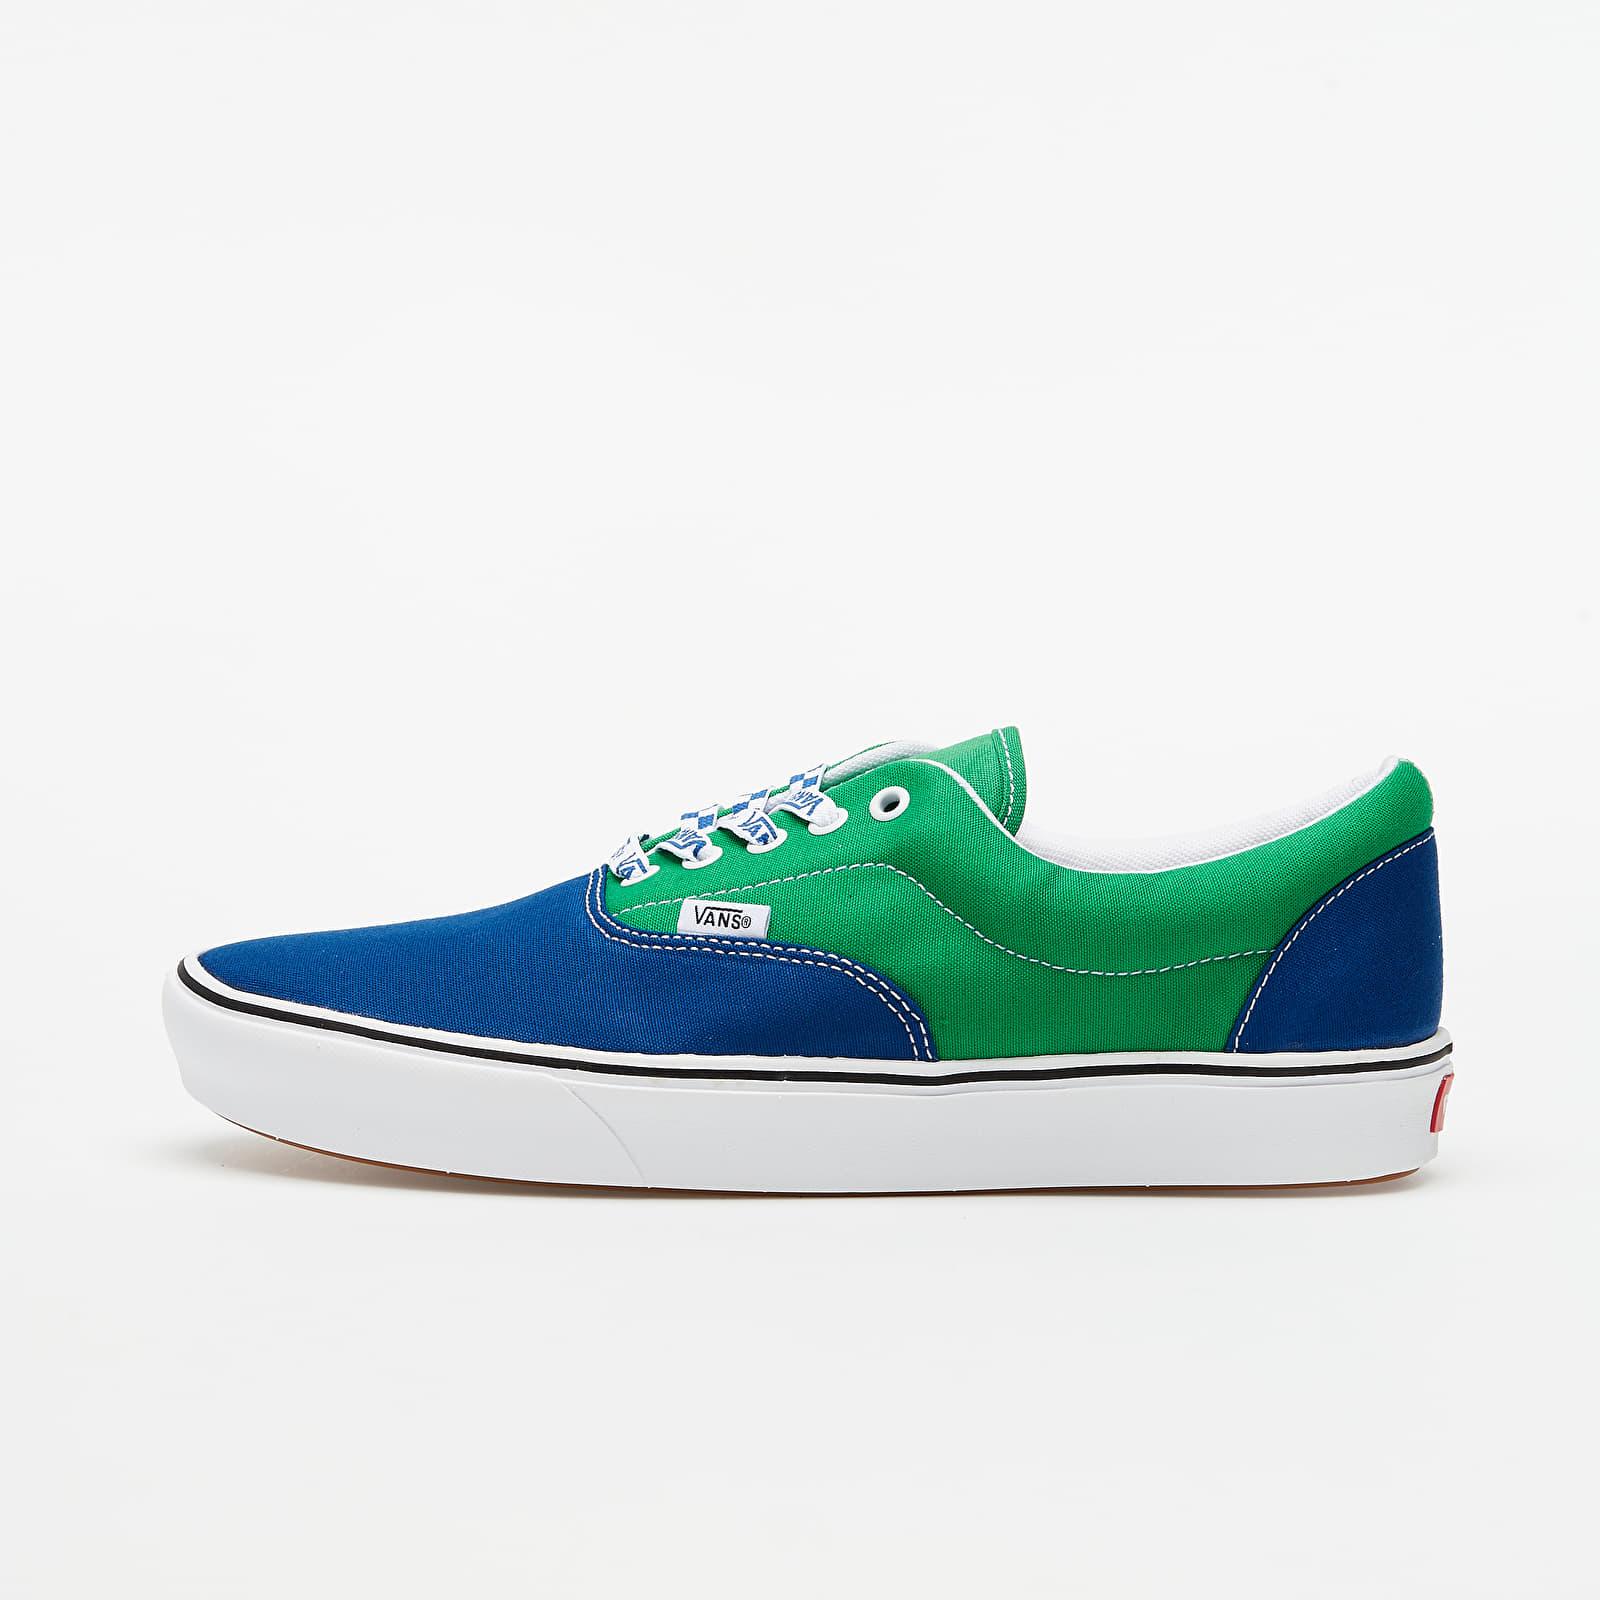 Buty męskie Vans ComfyCush Era (Lace Mix) True White/ Fern Green